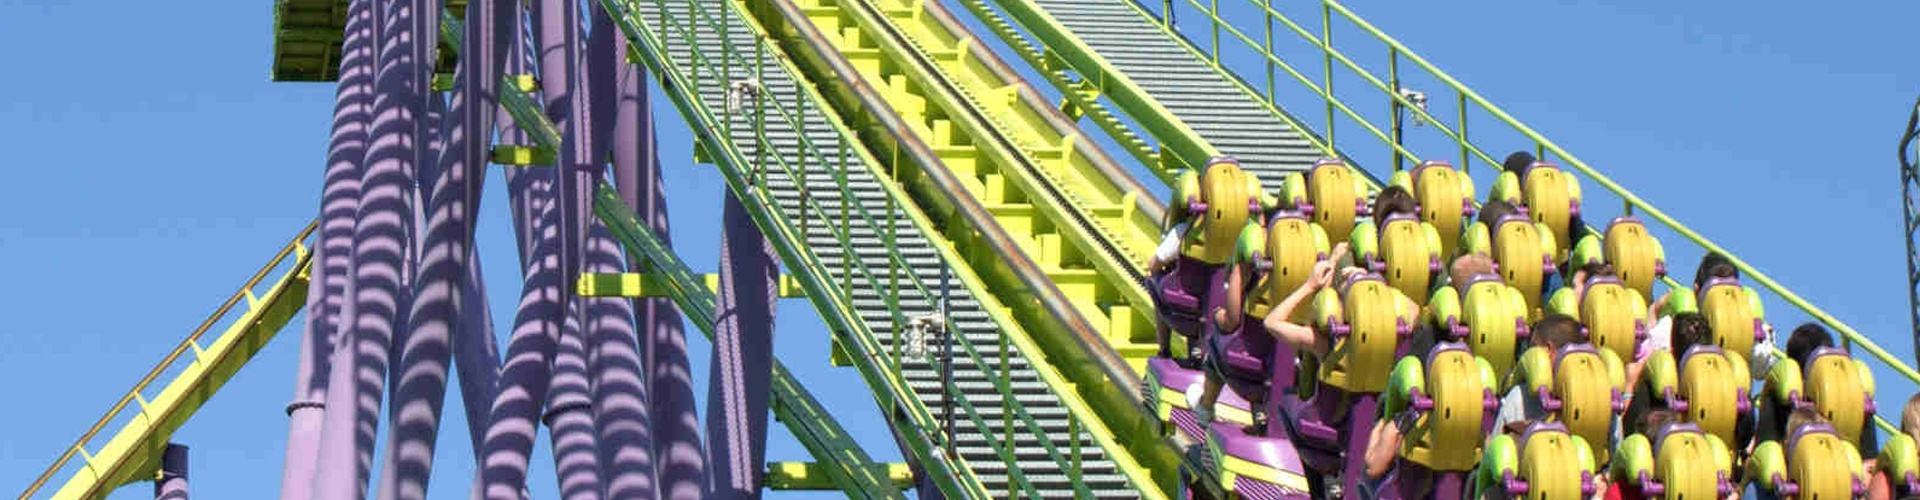 Top 5: Amusement Parks Near NYC